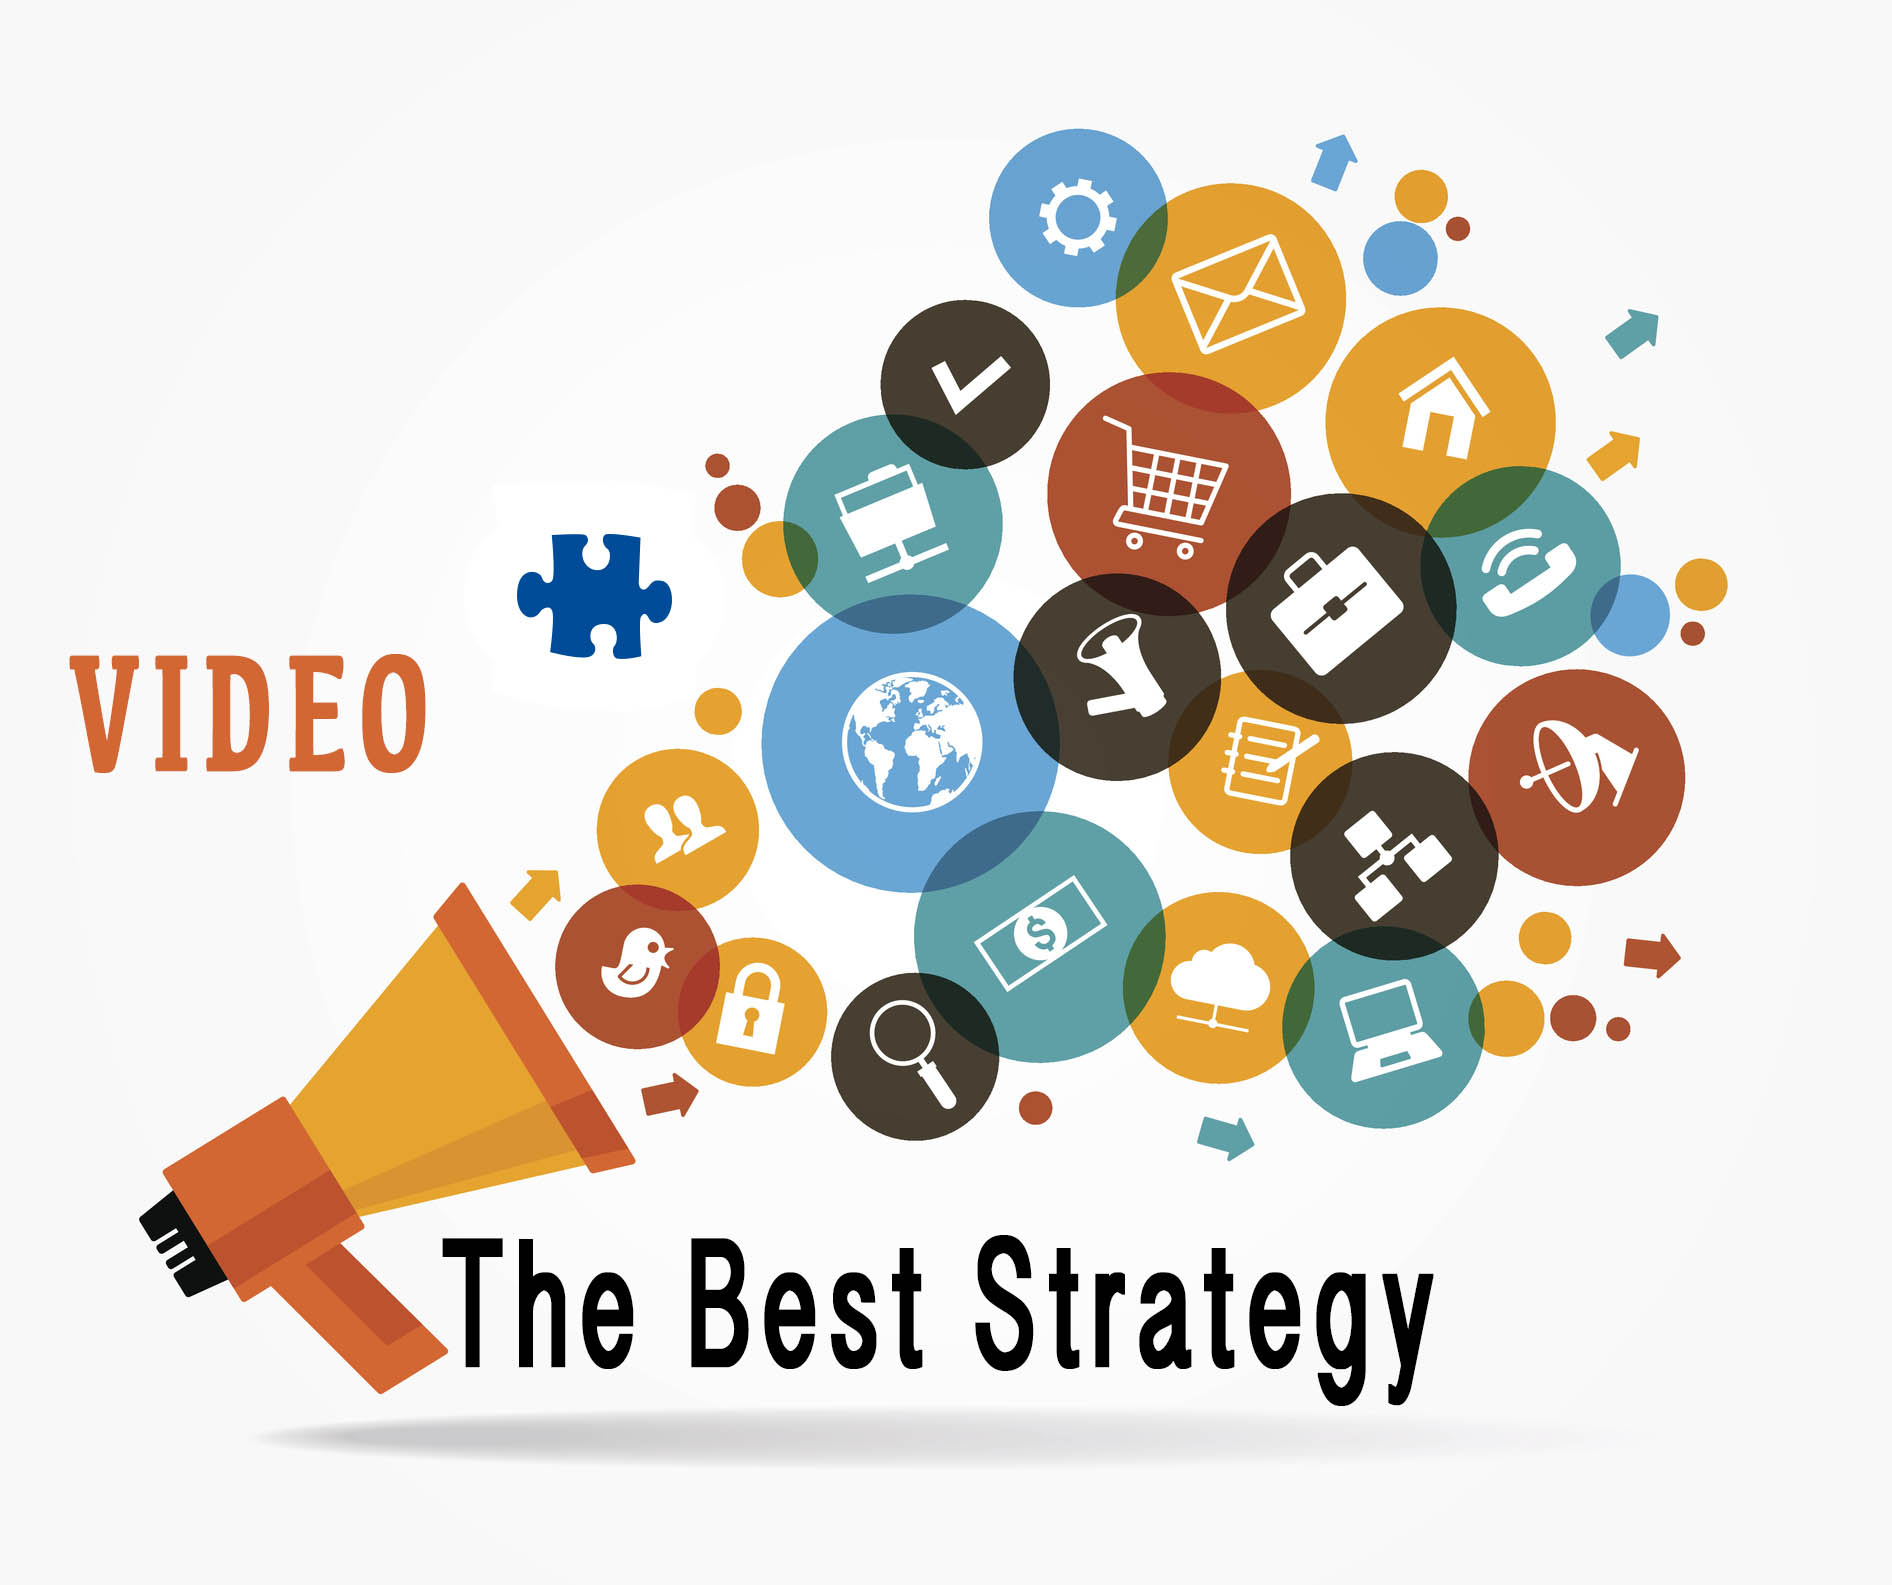 Best Strategy Video Marketing